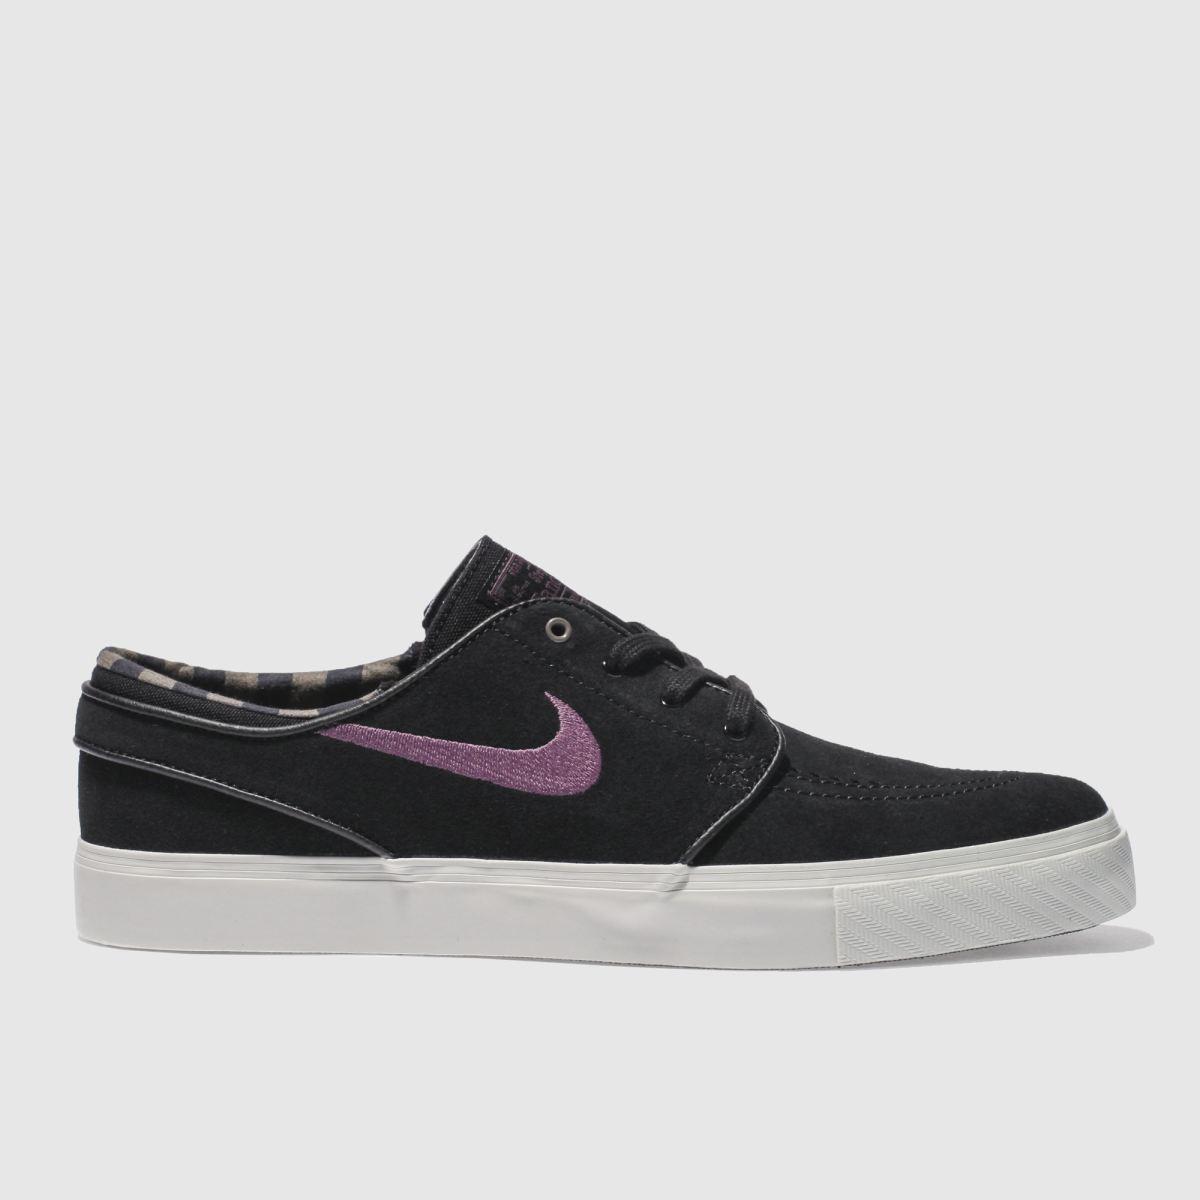 Nike SB Nike Sb Black & Purple Zoom Stefan Janoski Trainers